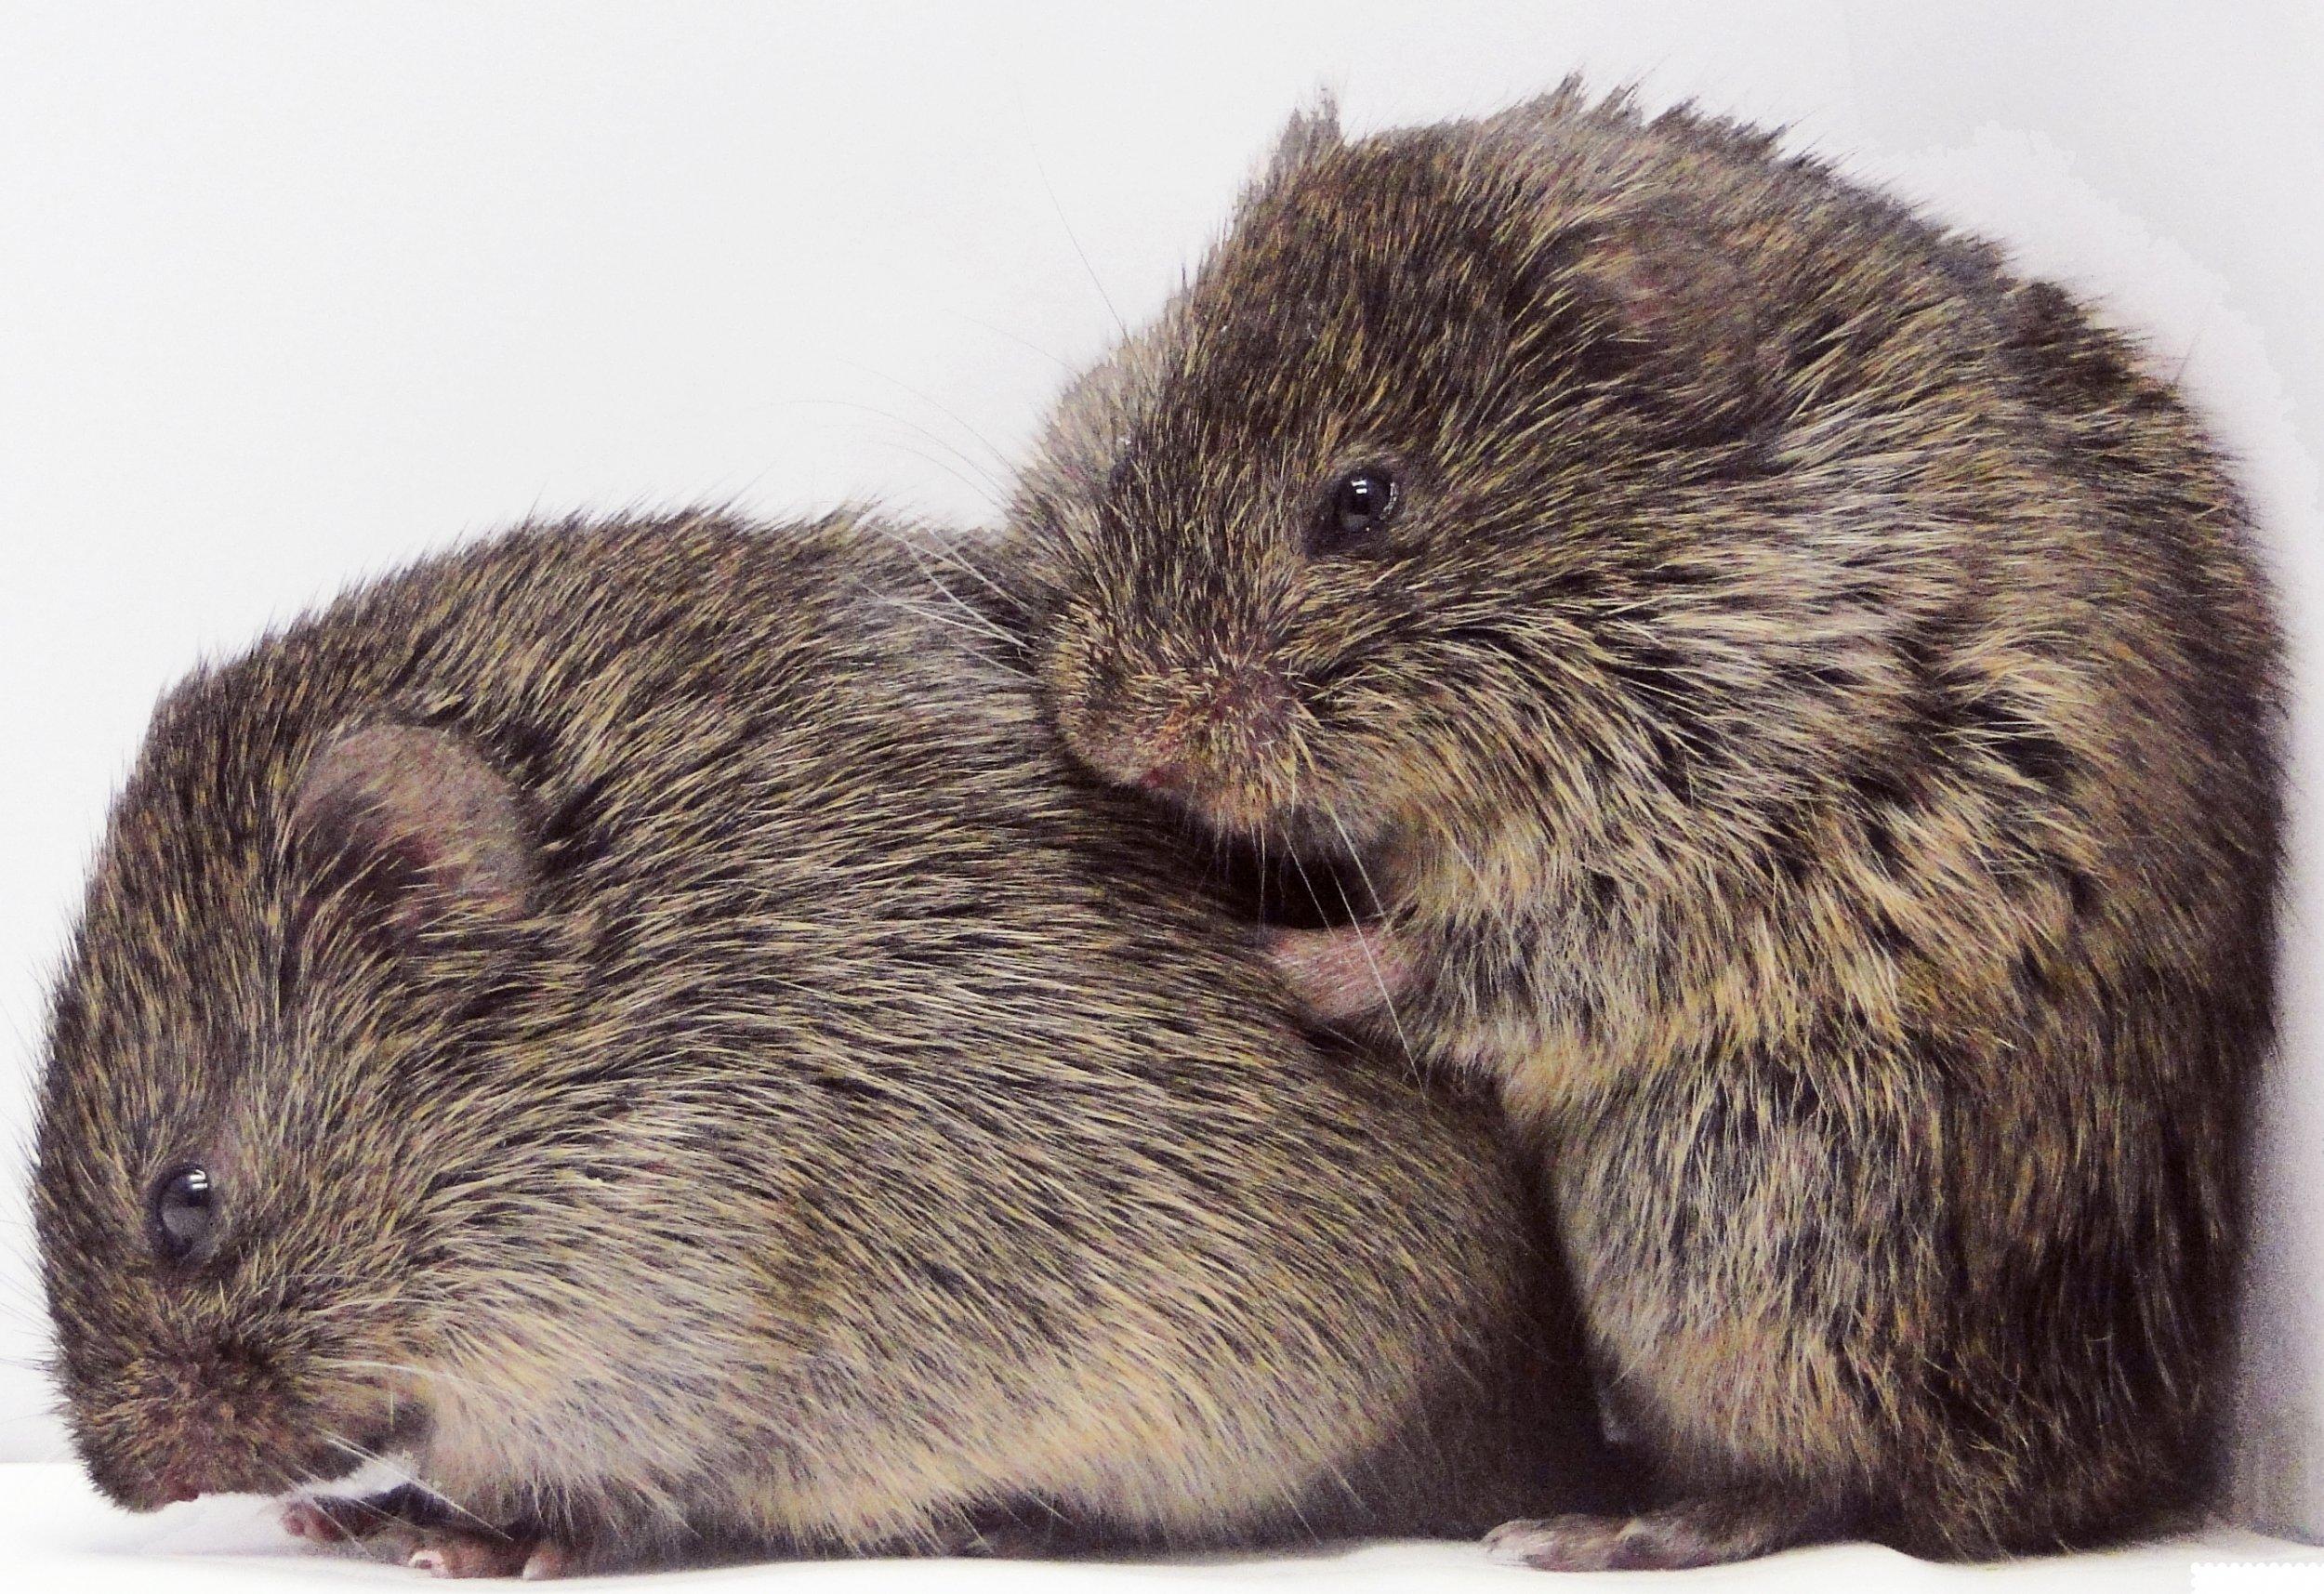 male and female vole